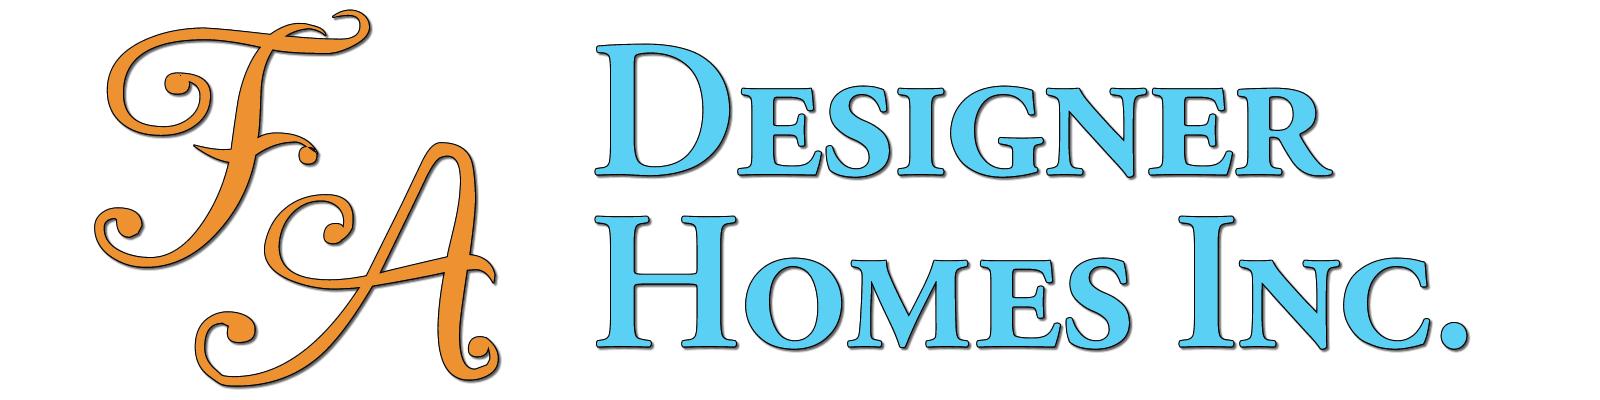 Felicia Austin Designer Homes